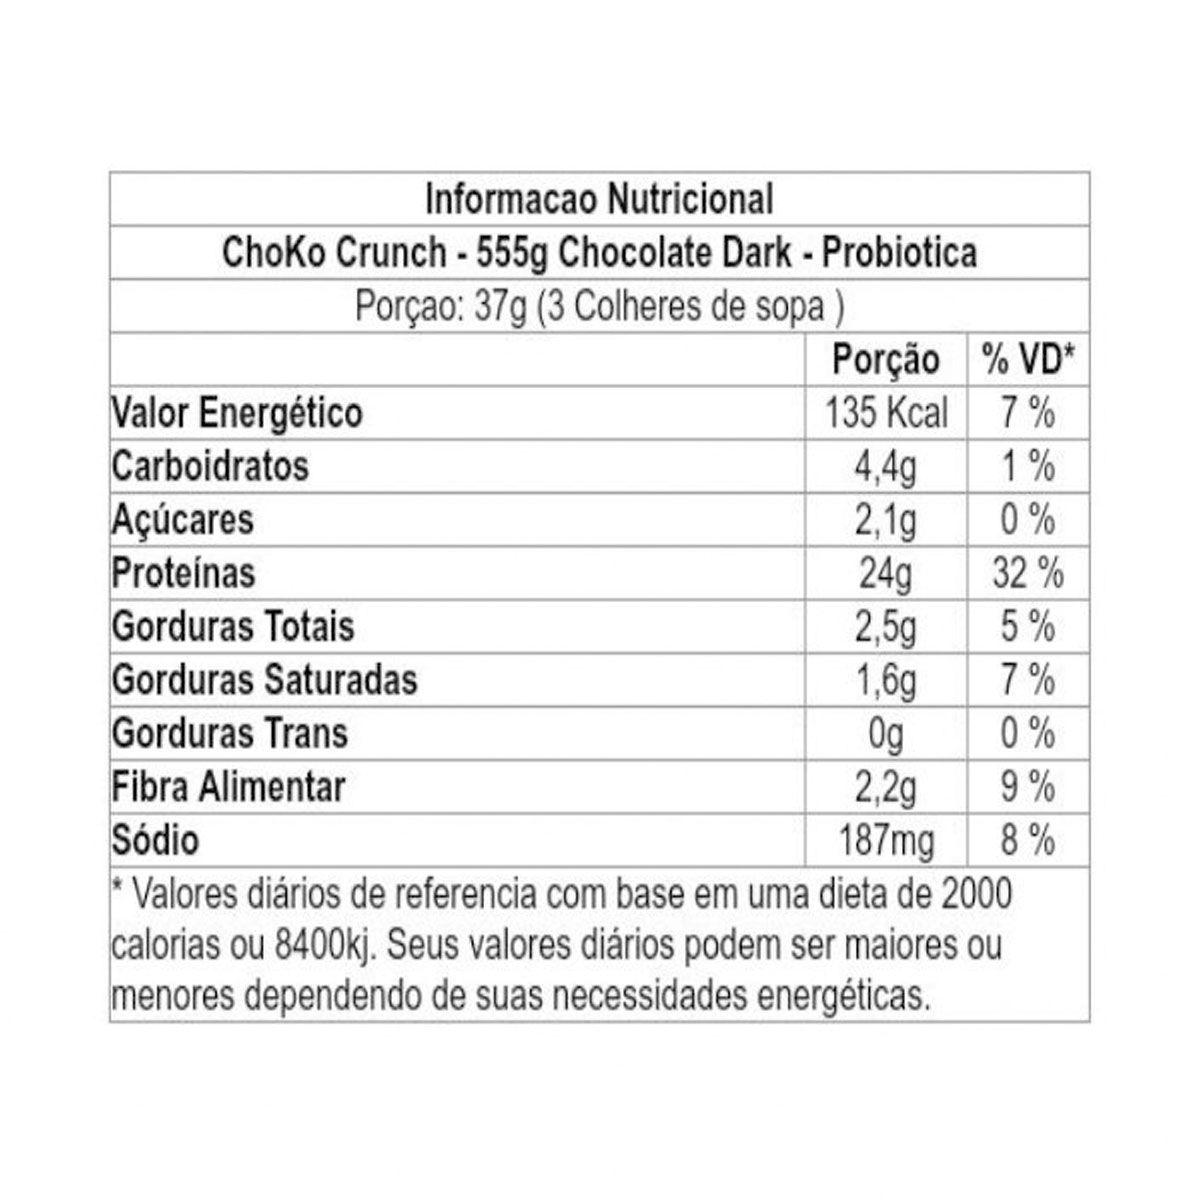 Choko Crunch Whey Protein Shake 555g - Probiótica